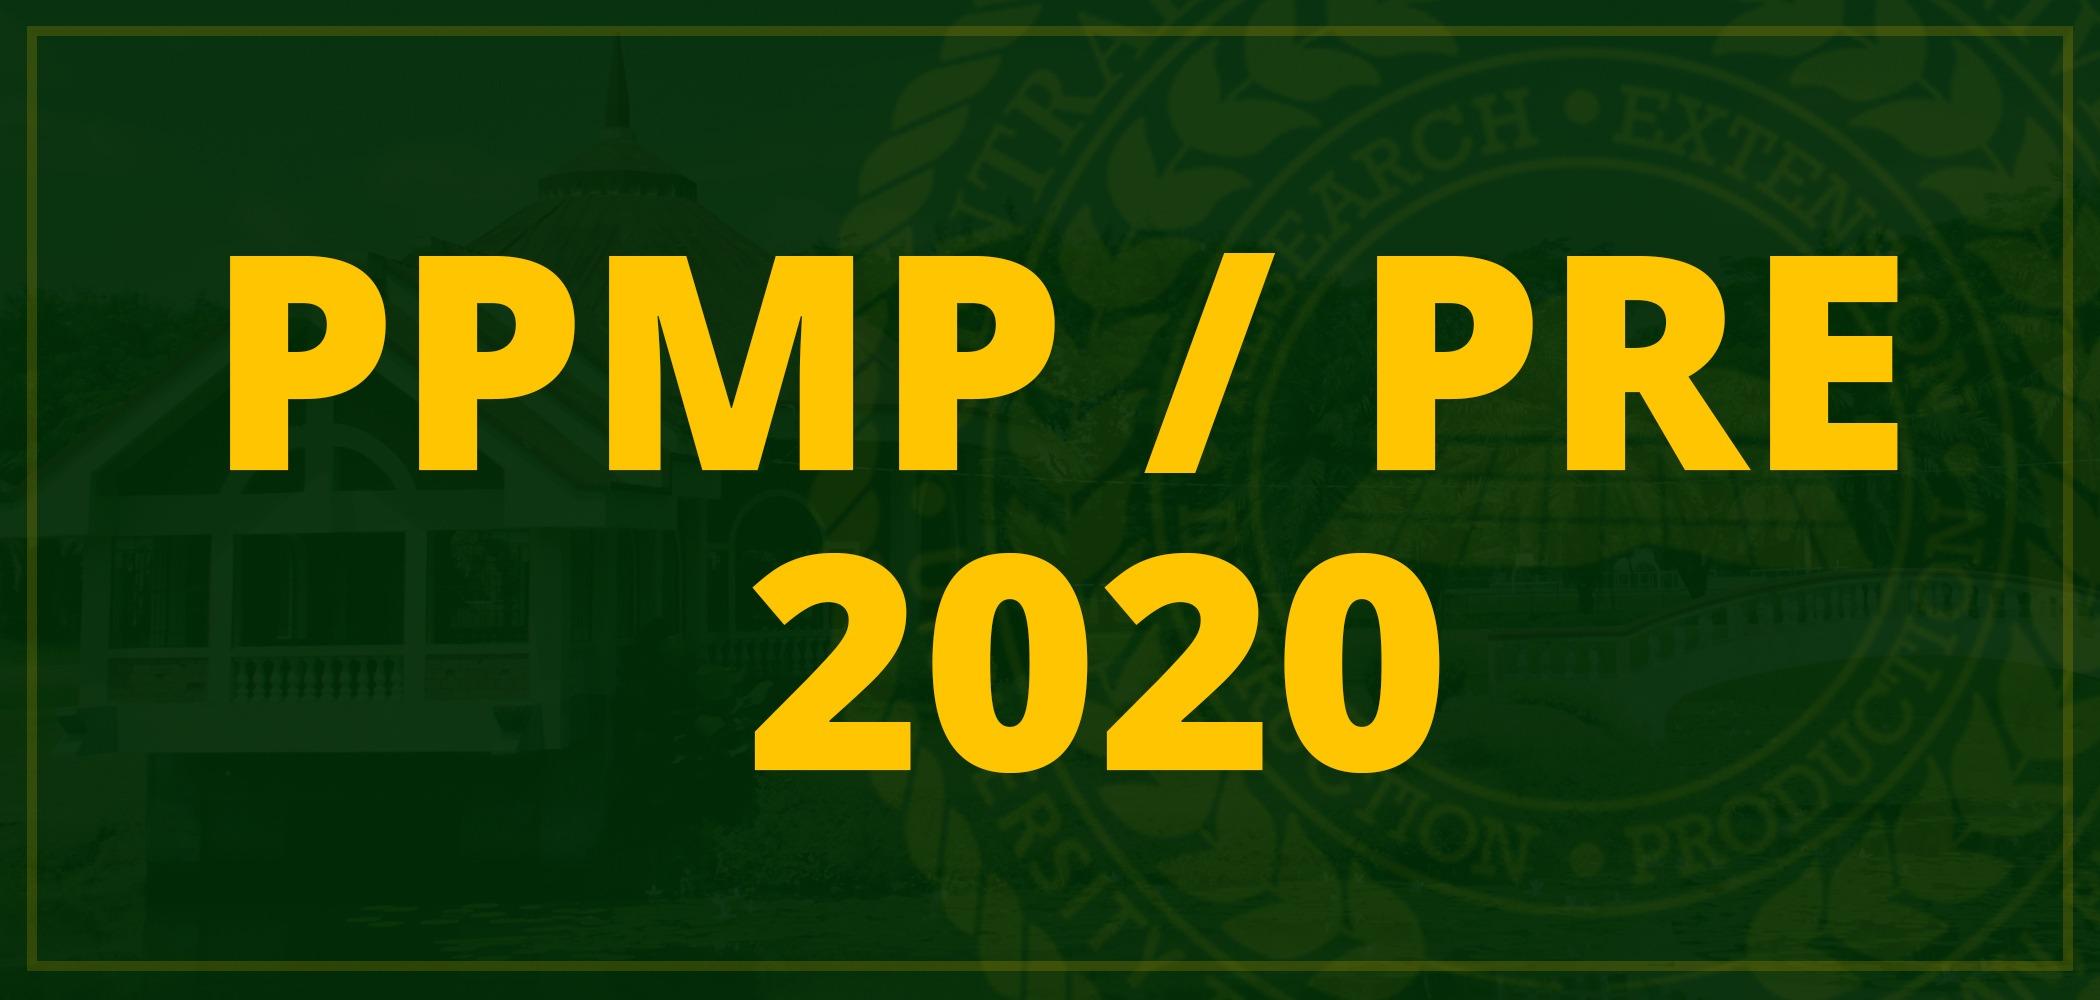 PPMP / PRE 2020